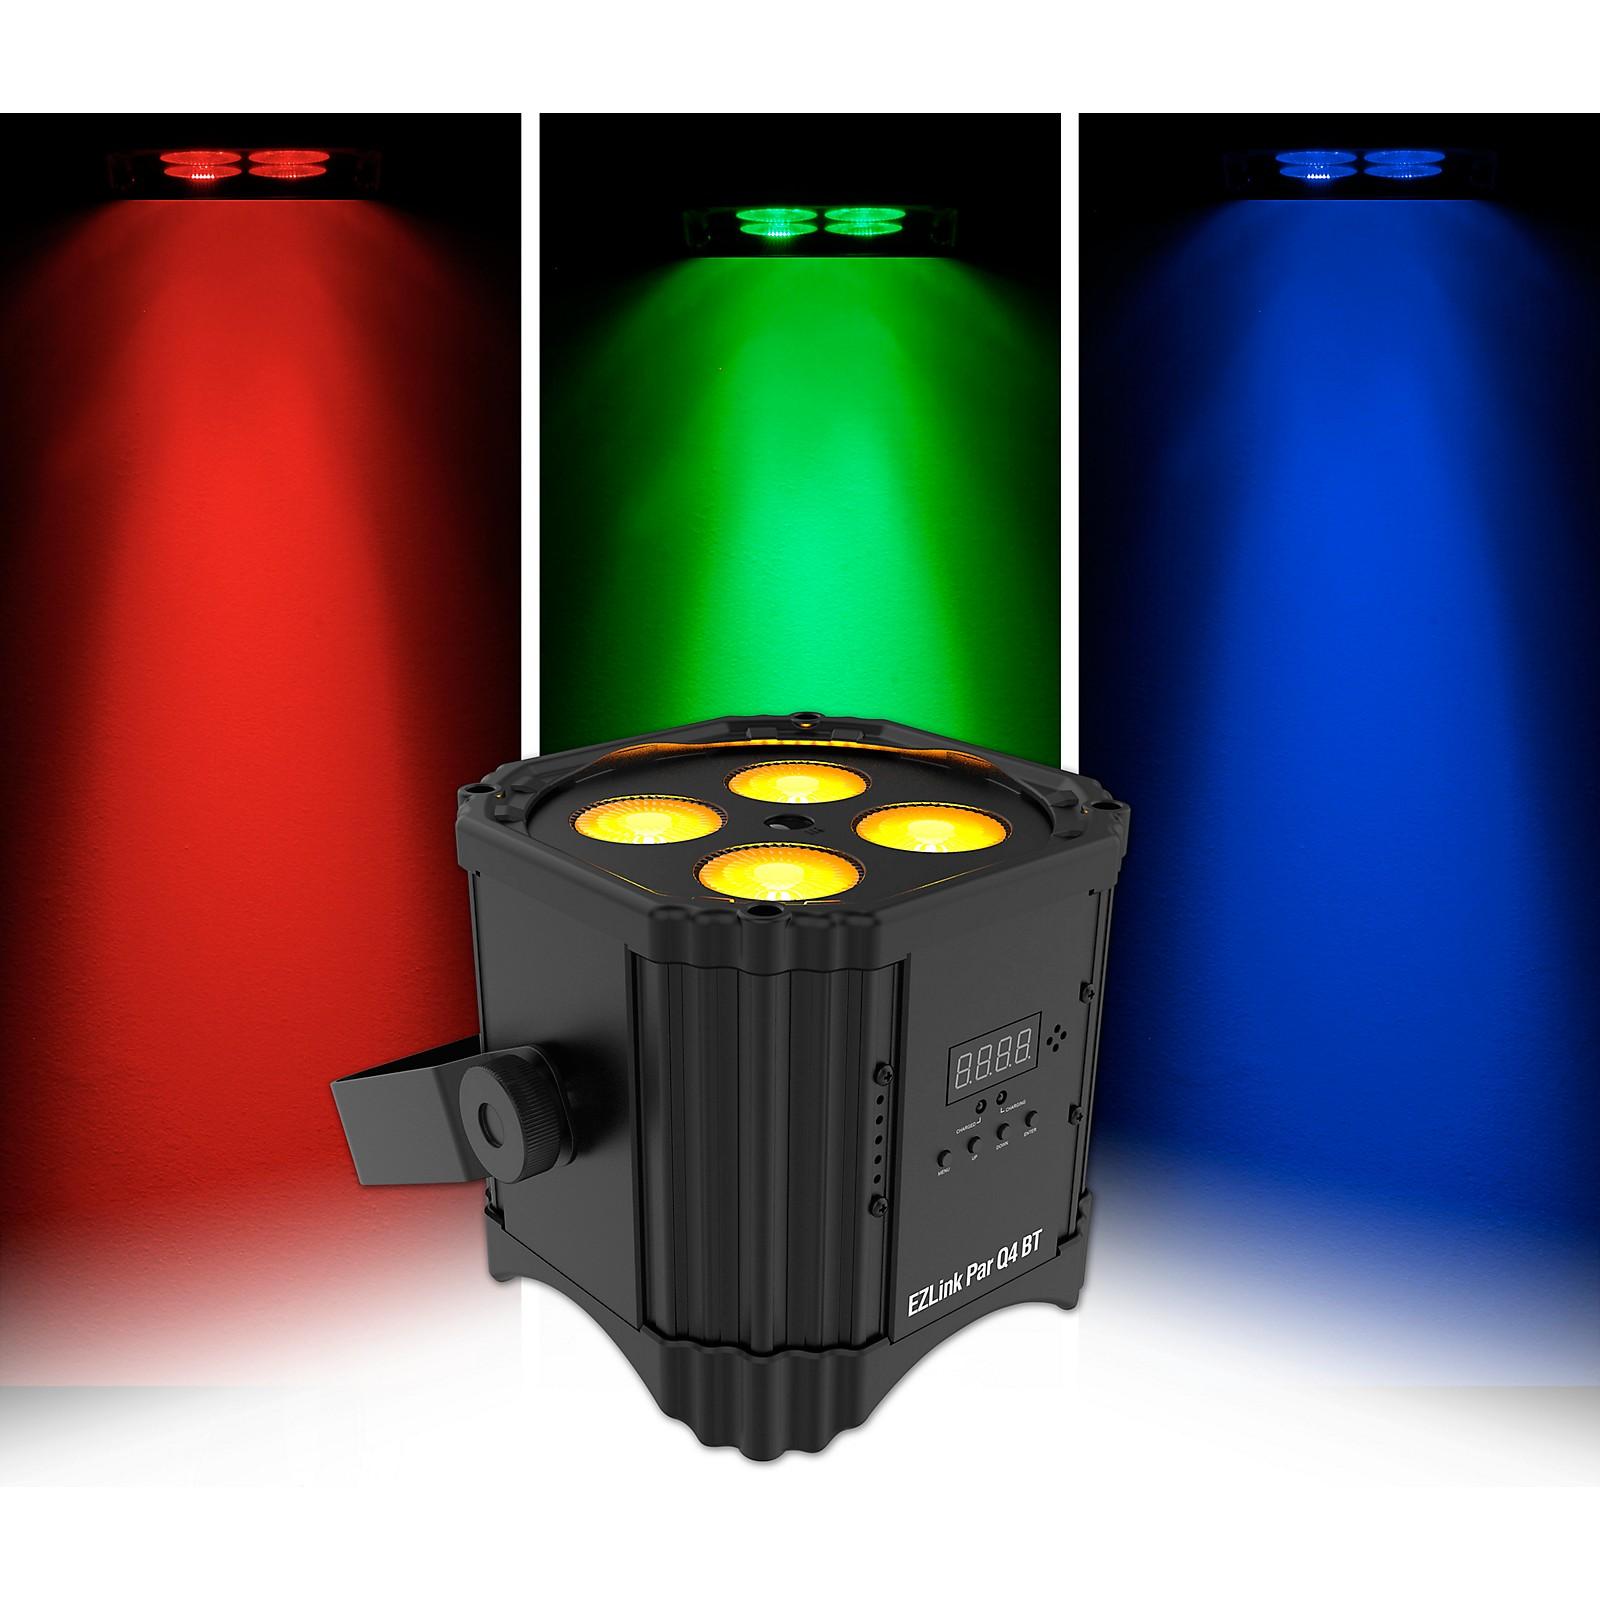 CHAUVET DJ EZLink Par Q4 BT RGBA LED Wireless Wash Light with Bluetooth